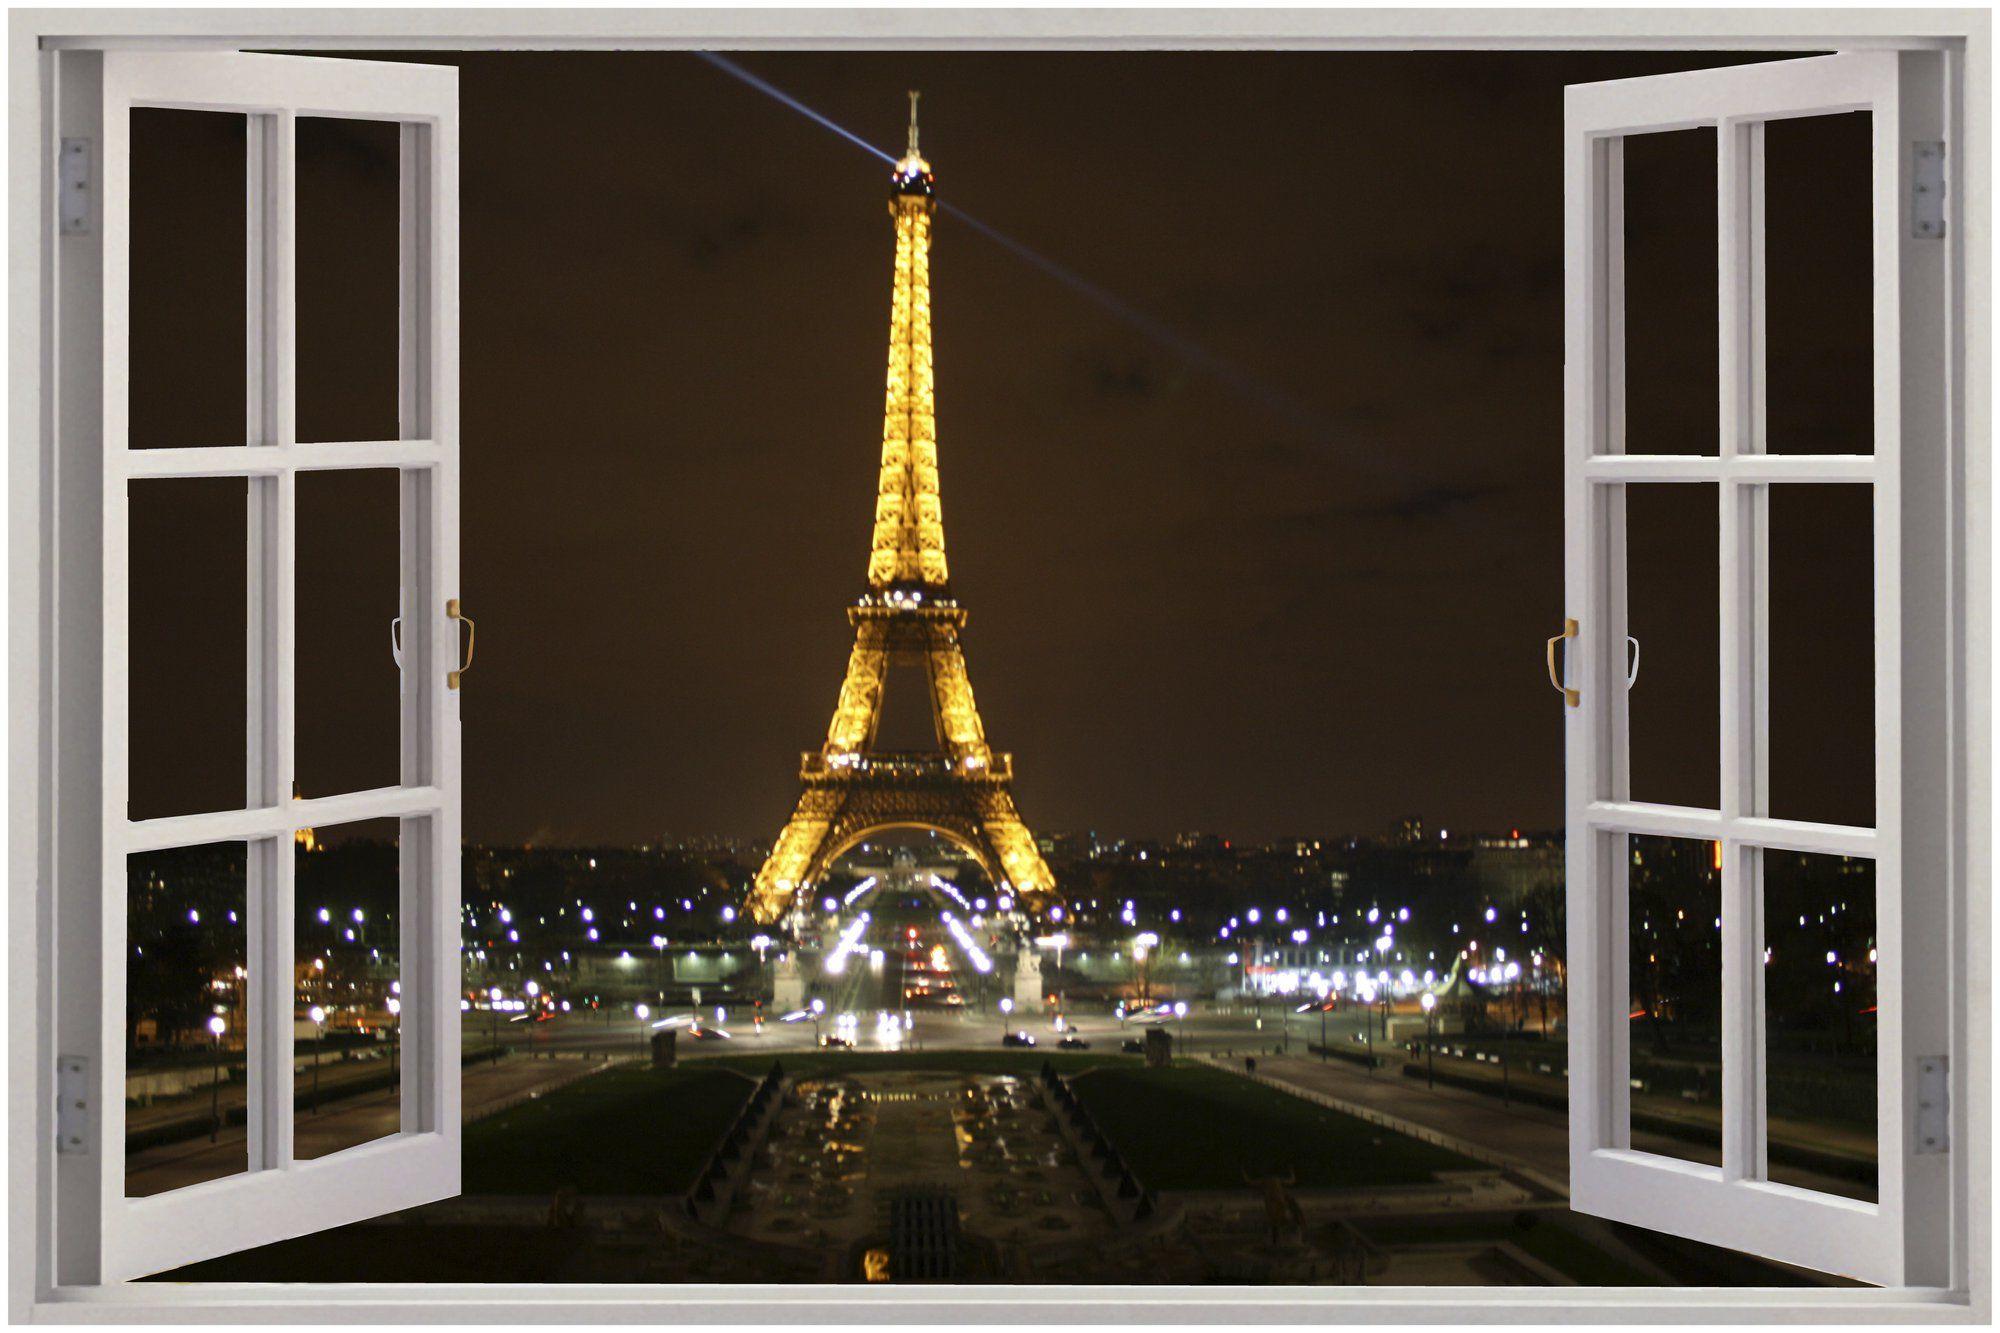 Parisian Window Decal Google Search Wall Stickers Paris Eiffel Tower At Night Mural Art